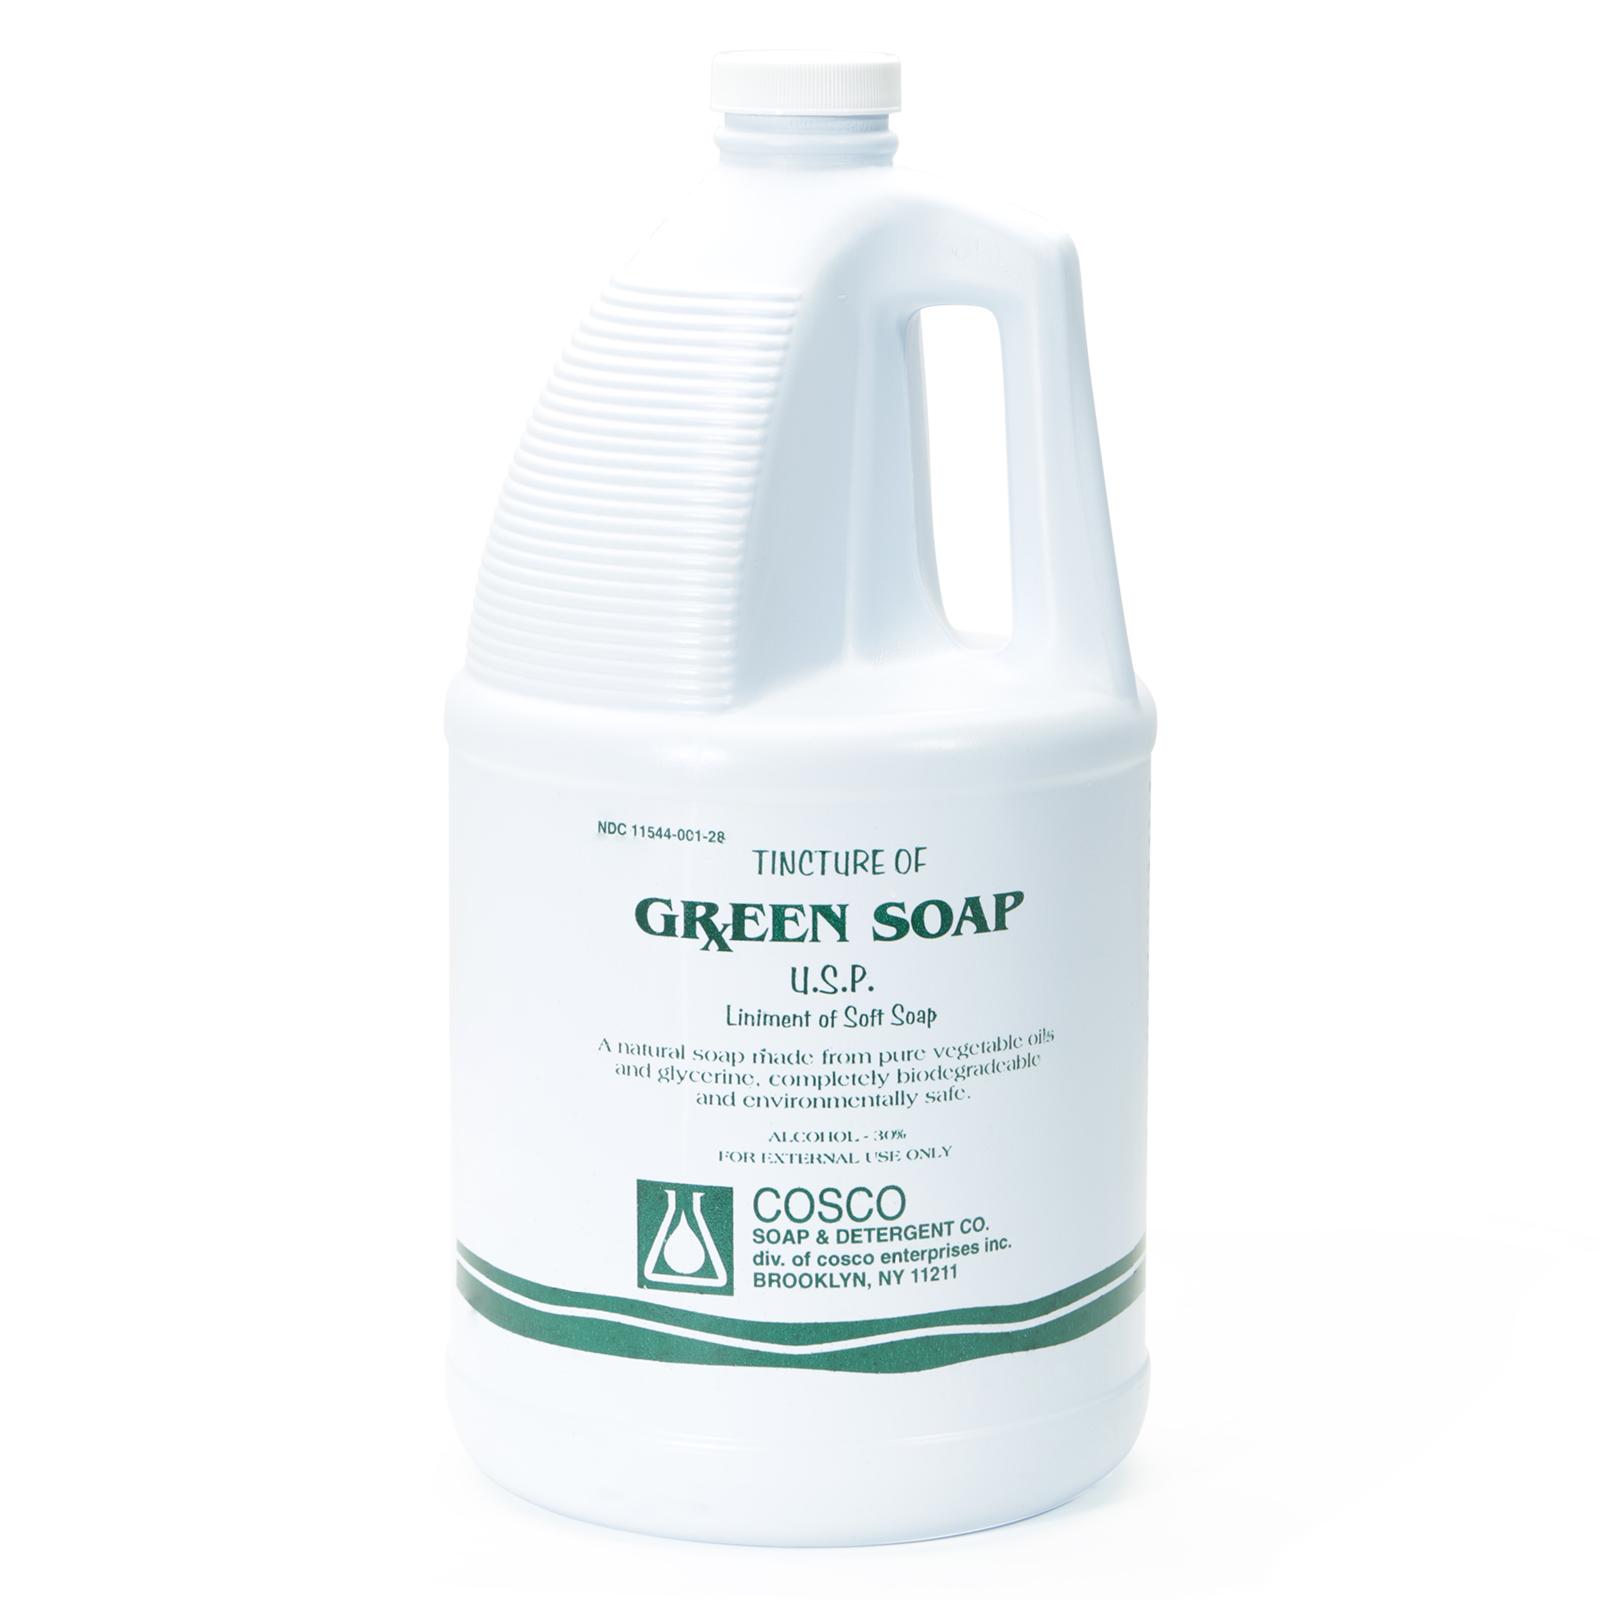 Pure-Green-Soap-Tattoo-Medical-Supplies thumbnail 5